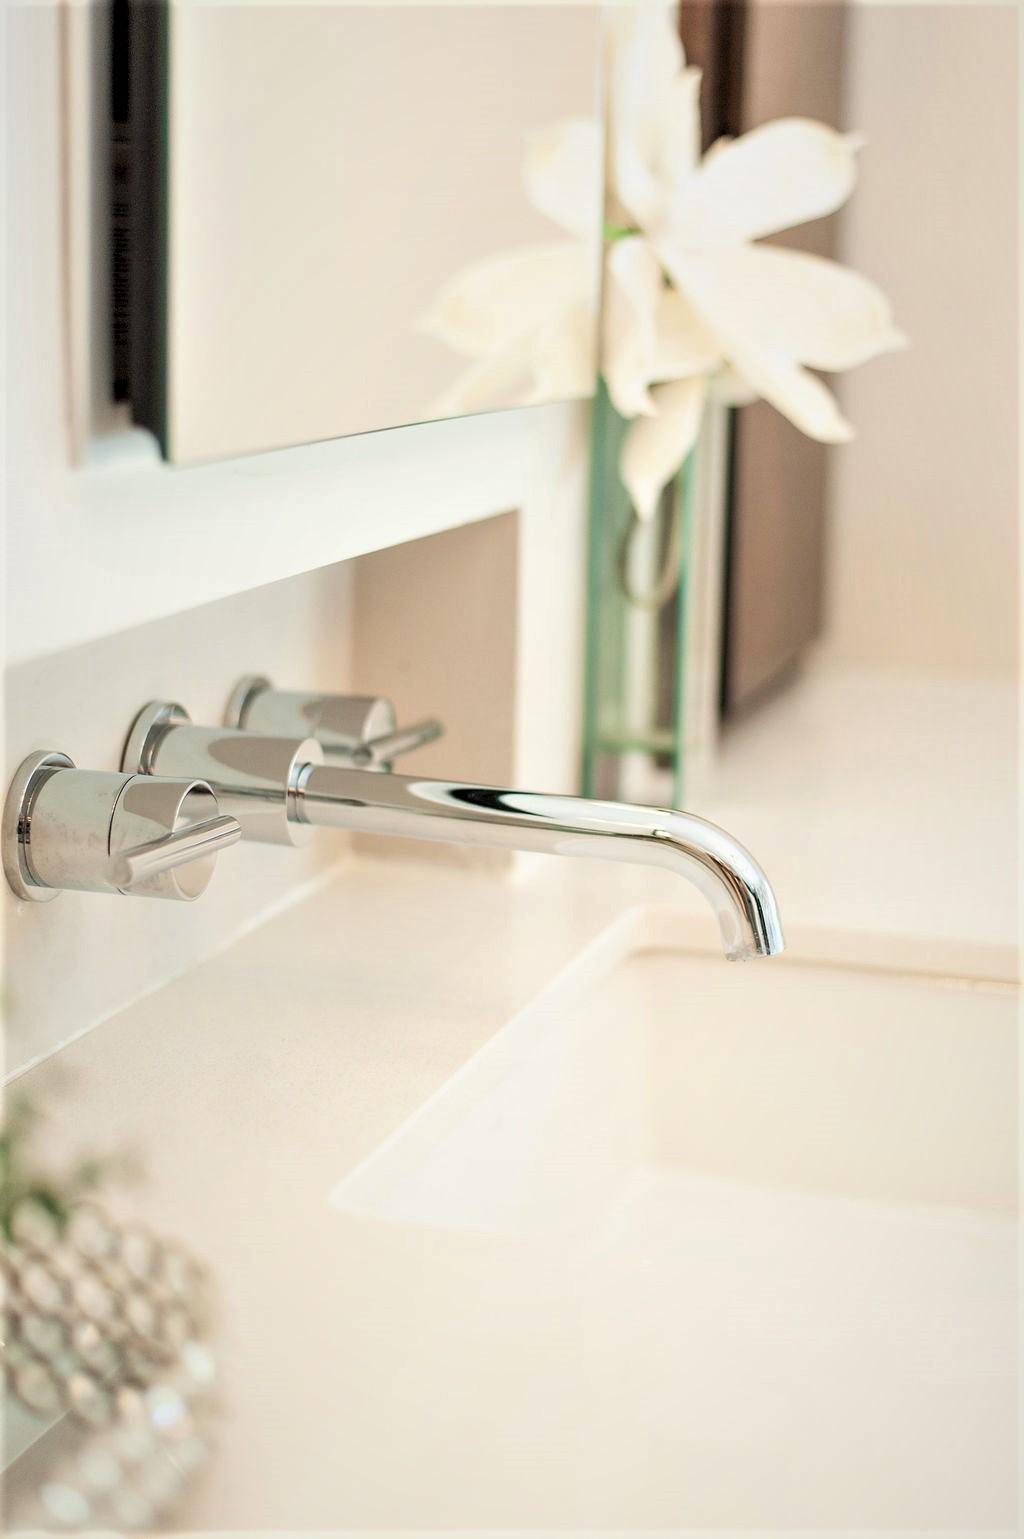 Blank-Canvas-Interior-Design-in-kansas-city-Faucet-bathroom-closeup.jpg